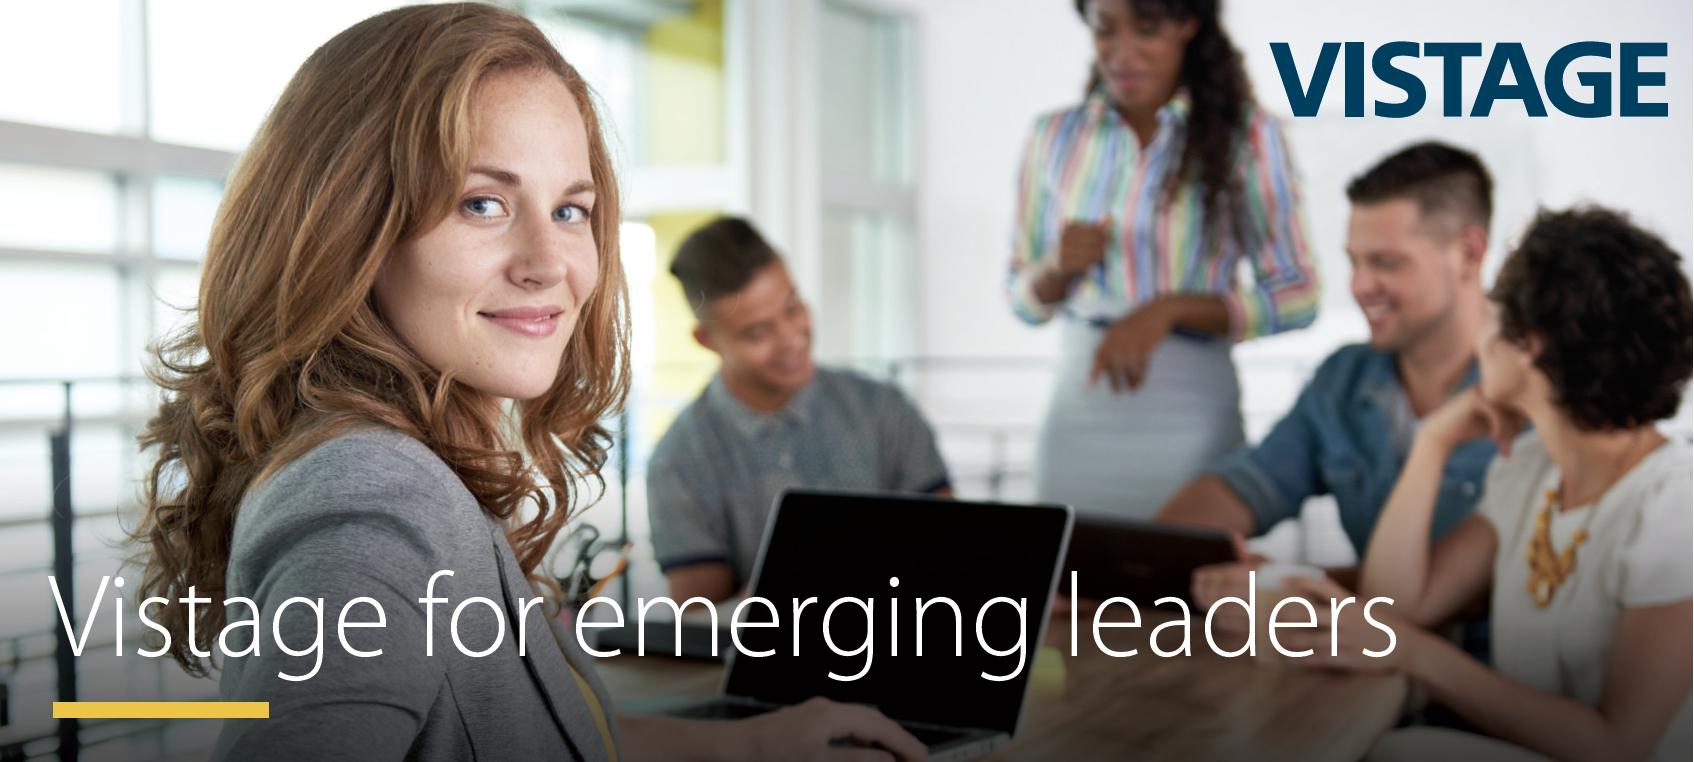 Vistage for emerging leaders